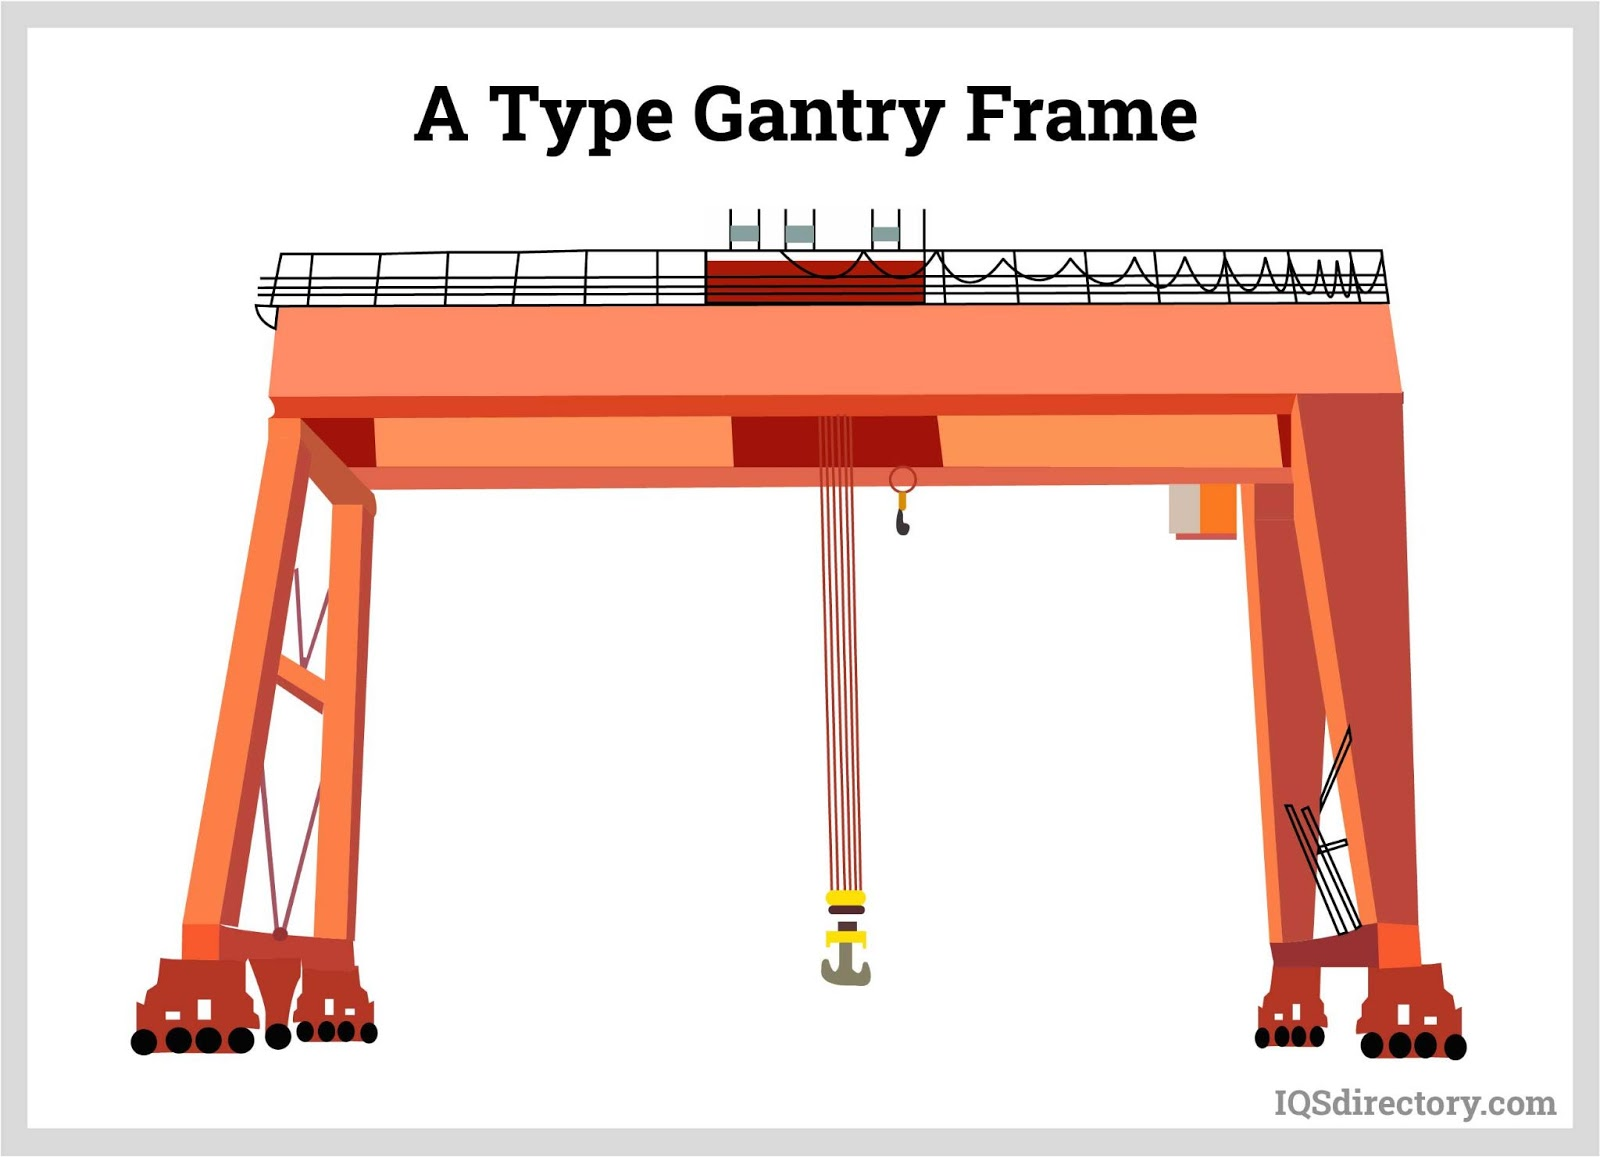 A Type Gantry Frame